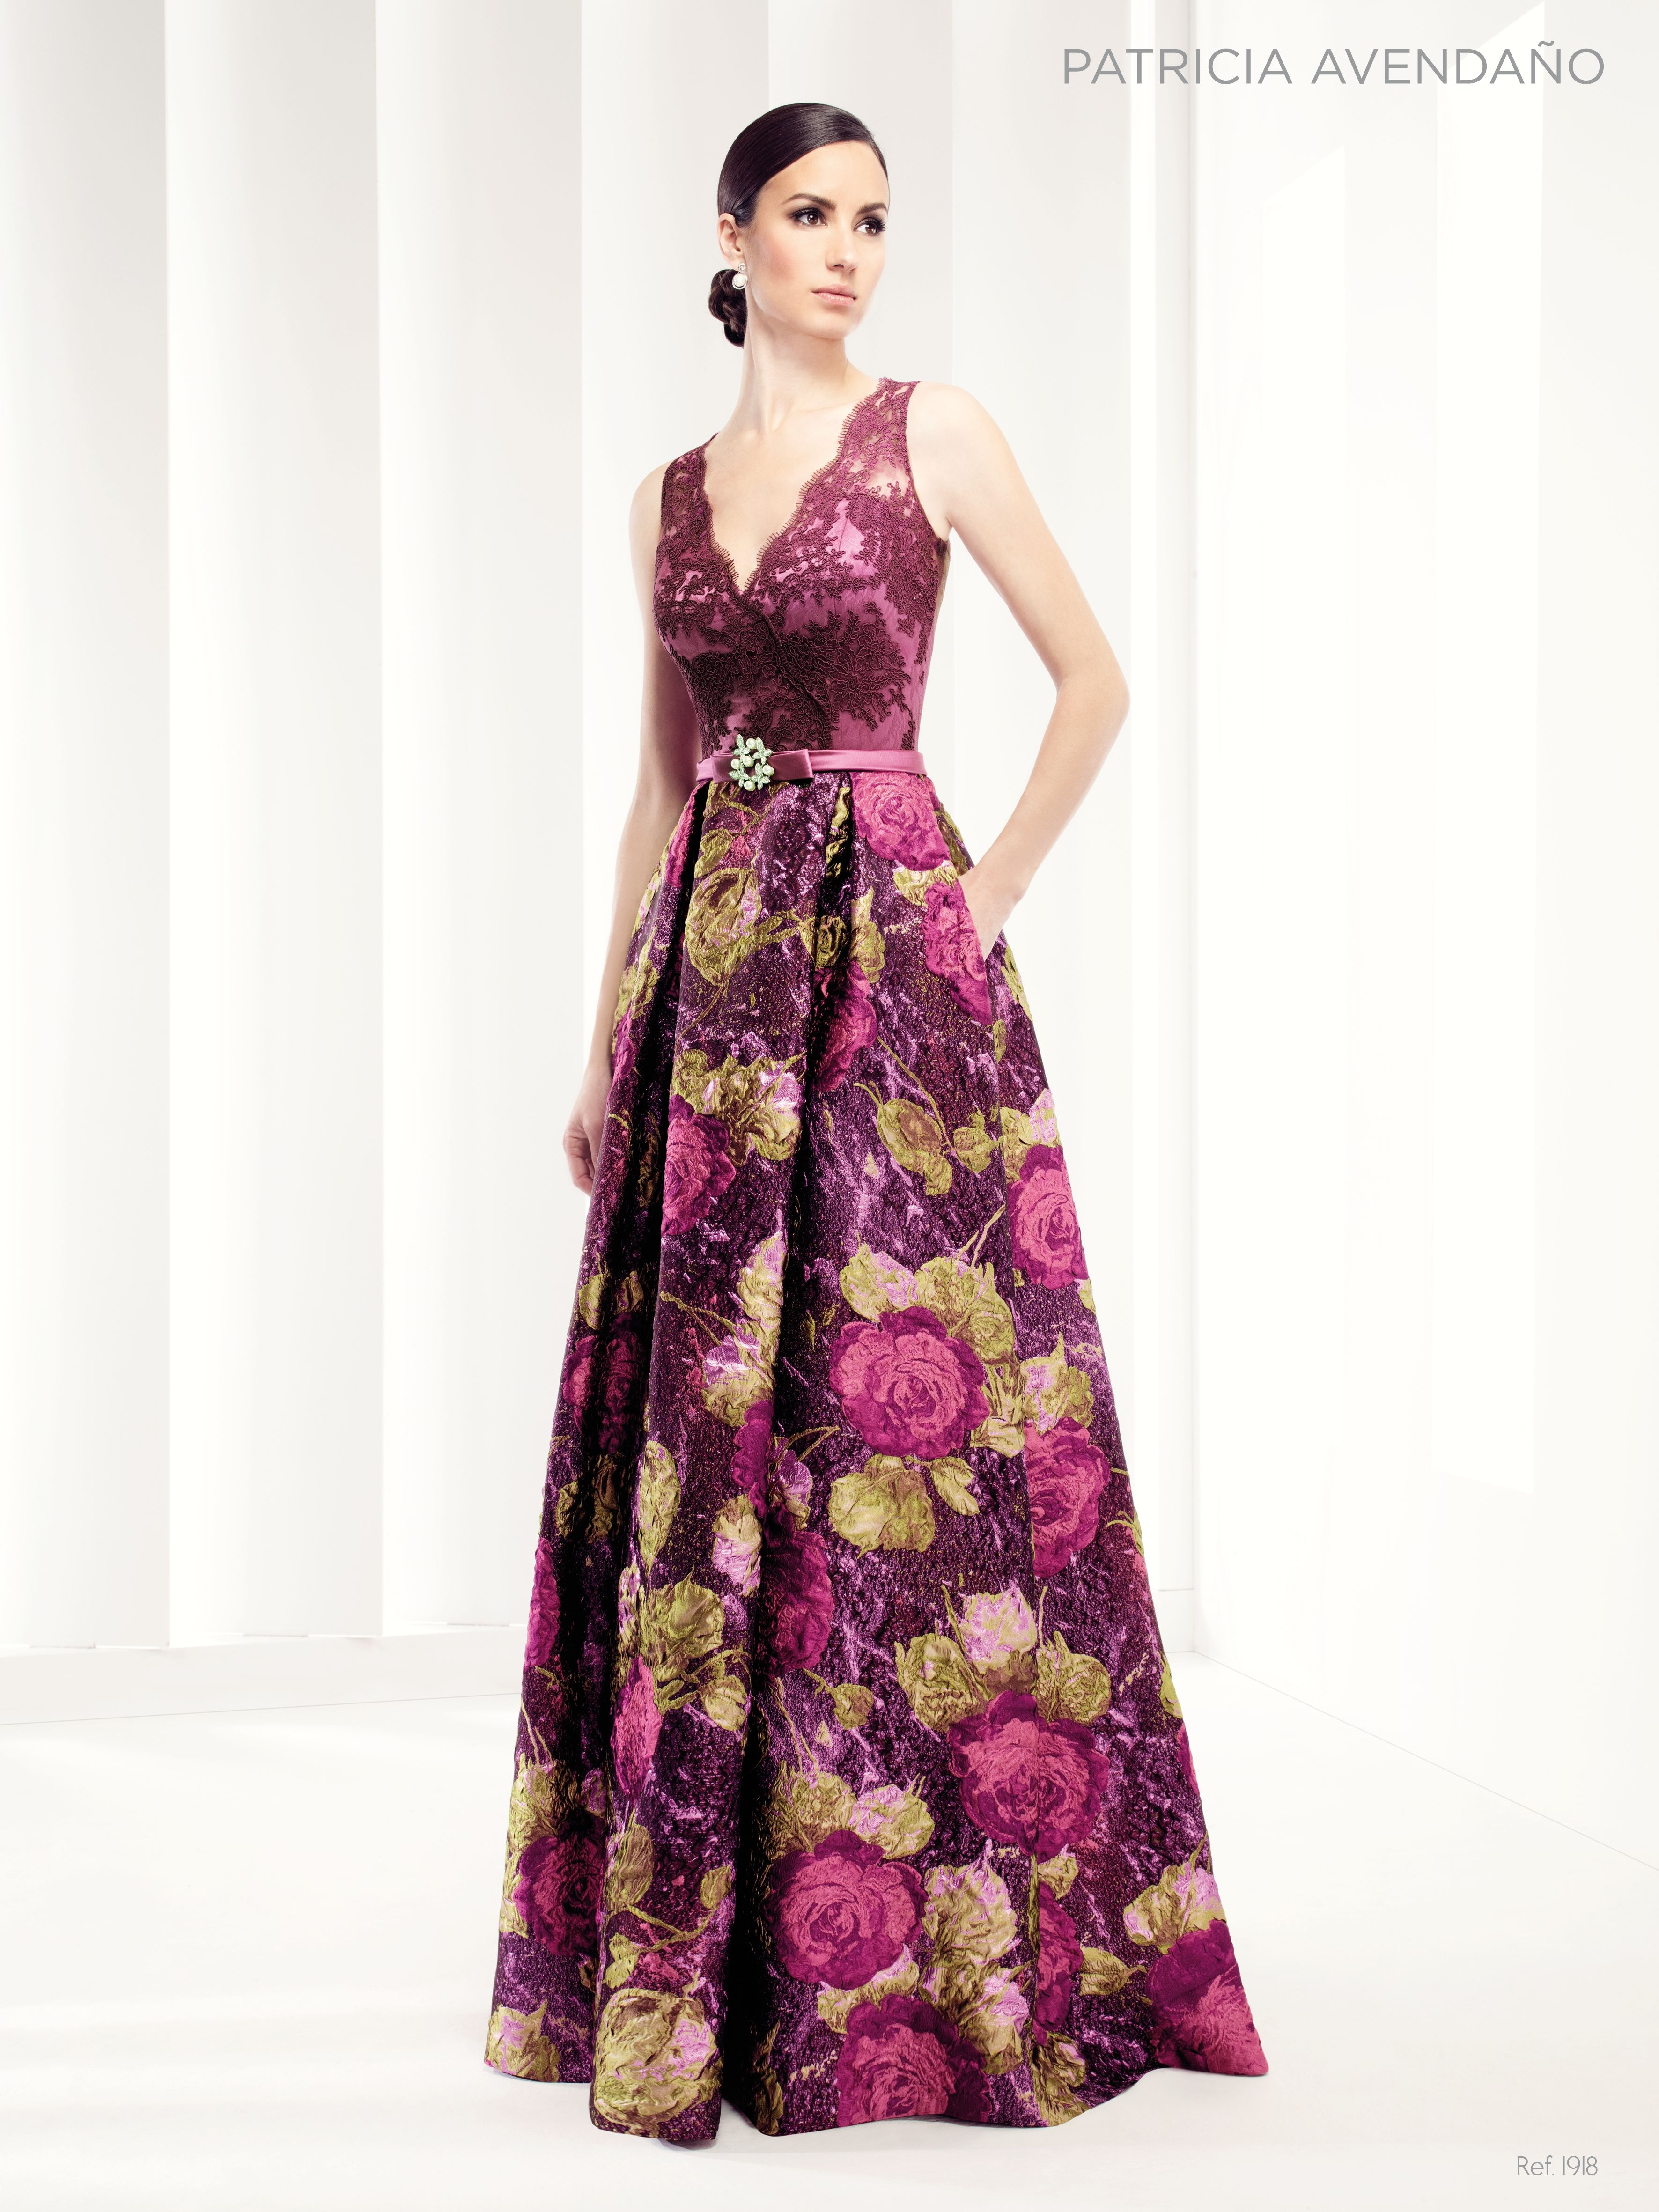 1918 - Vestido de Fiesta - Patricia Avendaño | Moda | Pinterest ...